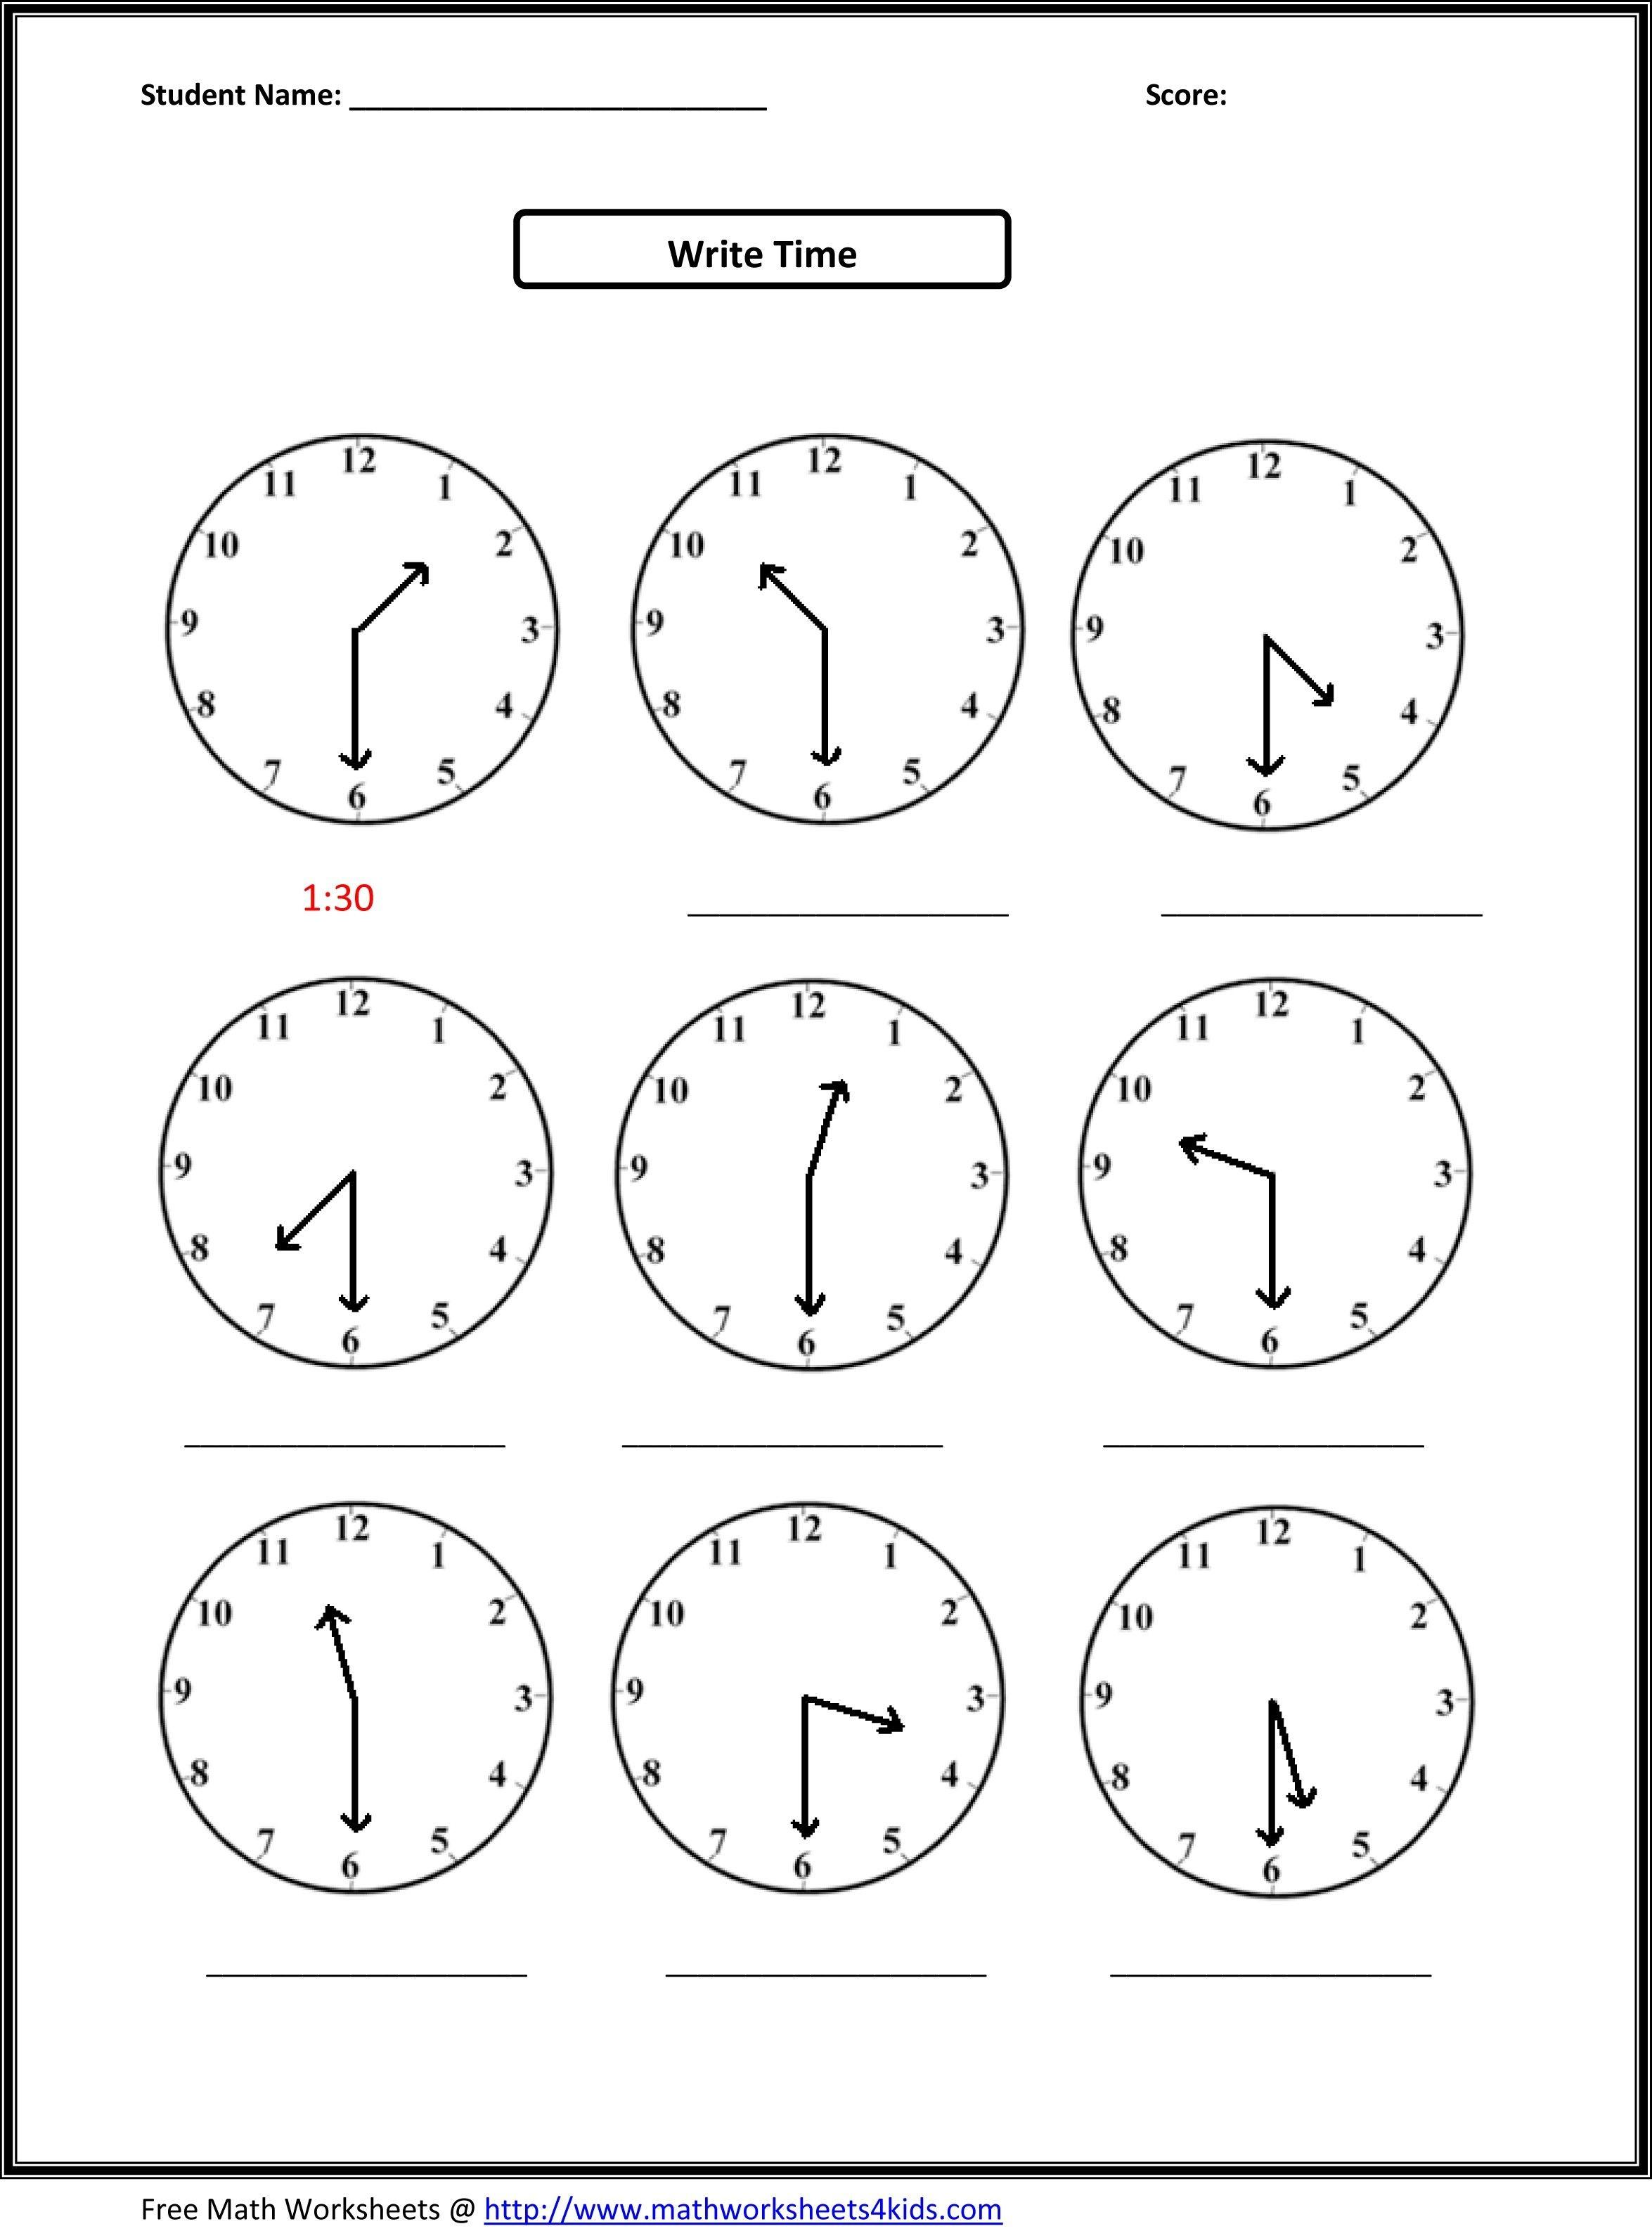 2Nd Grade Free Worksheets Math | Math: Time/measurement | 2Nd Grade - Free Printable Math Worksheets For 2Nd Grade